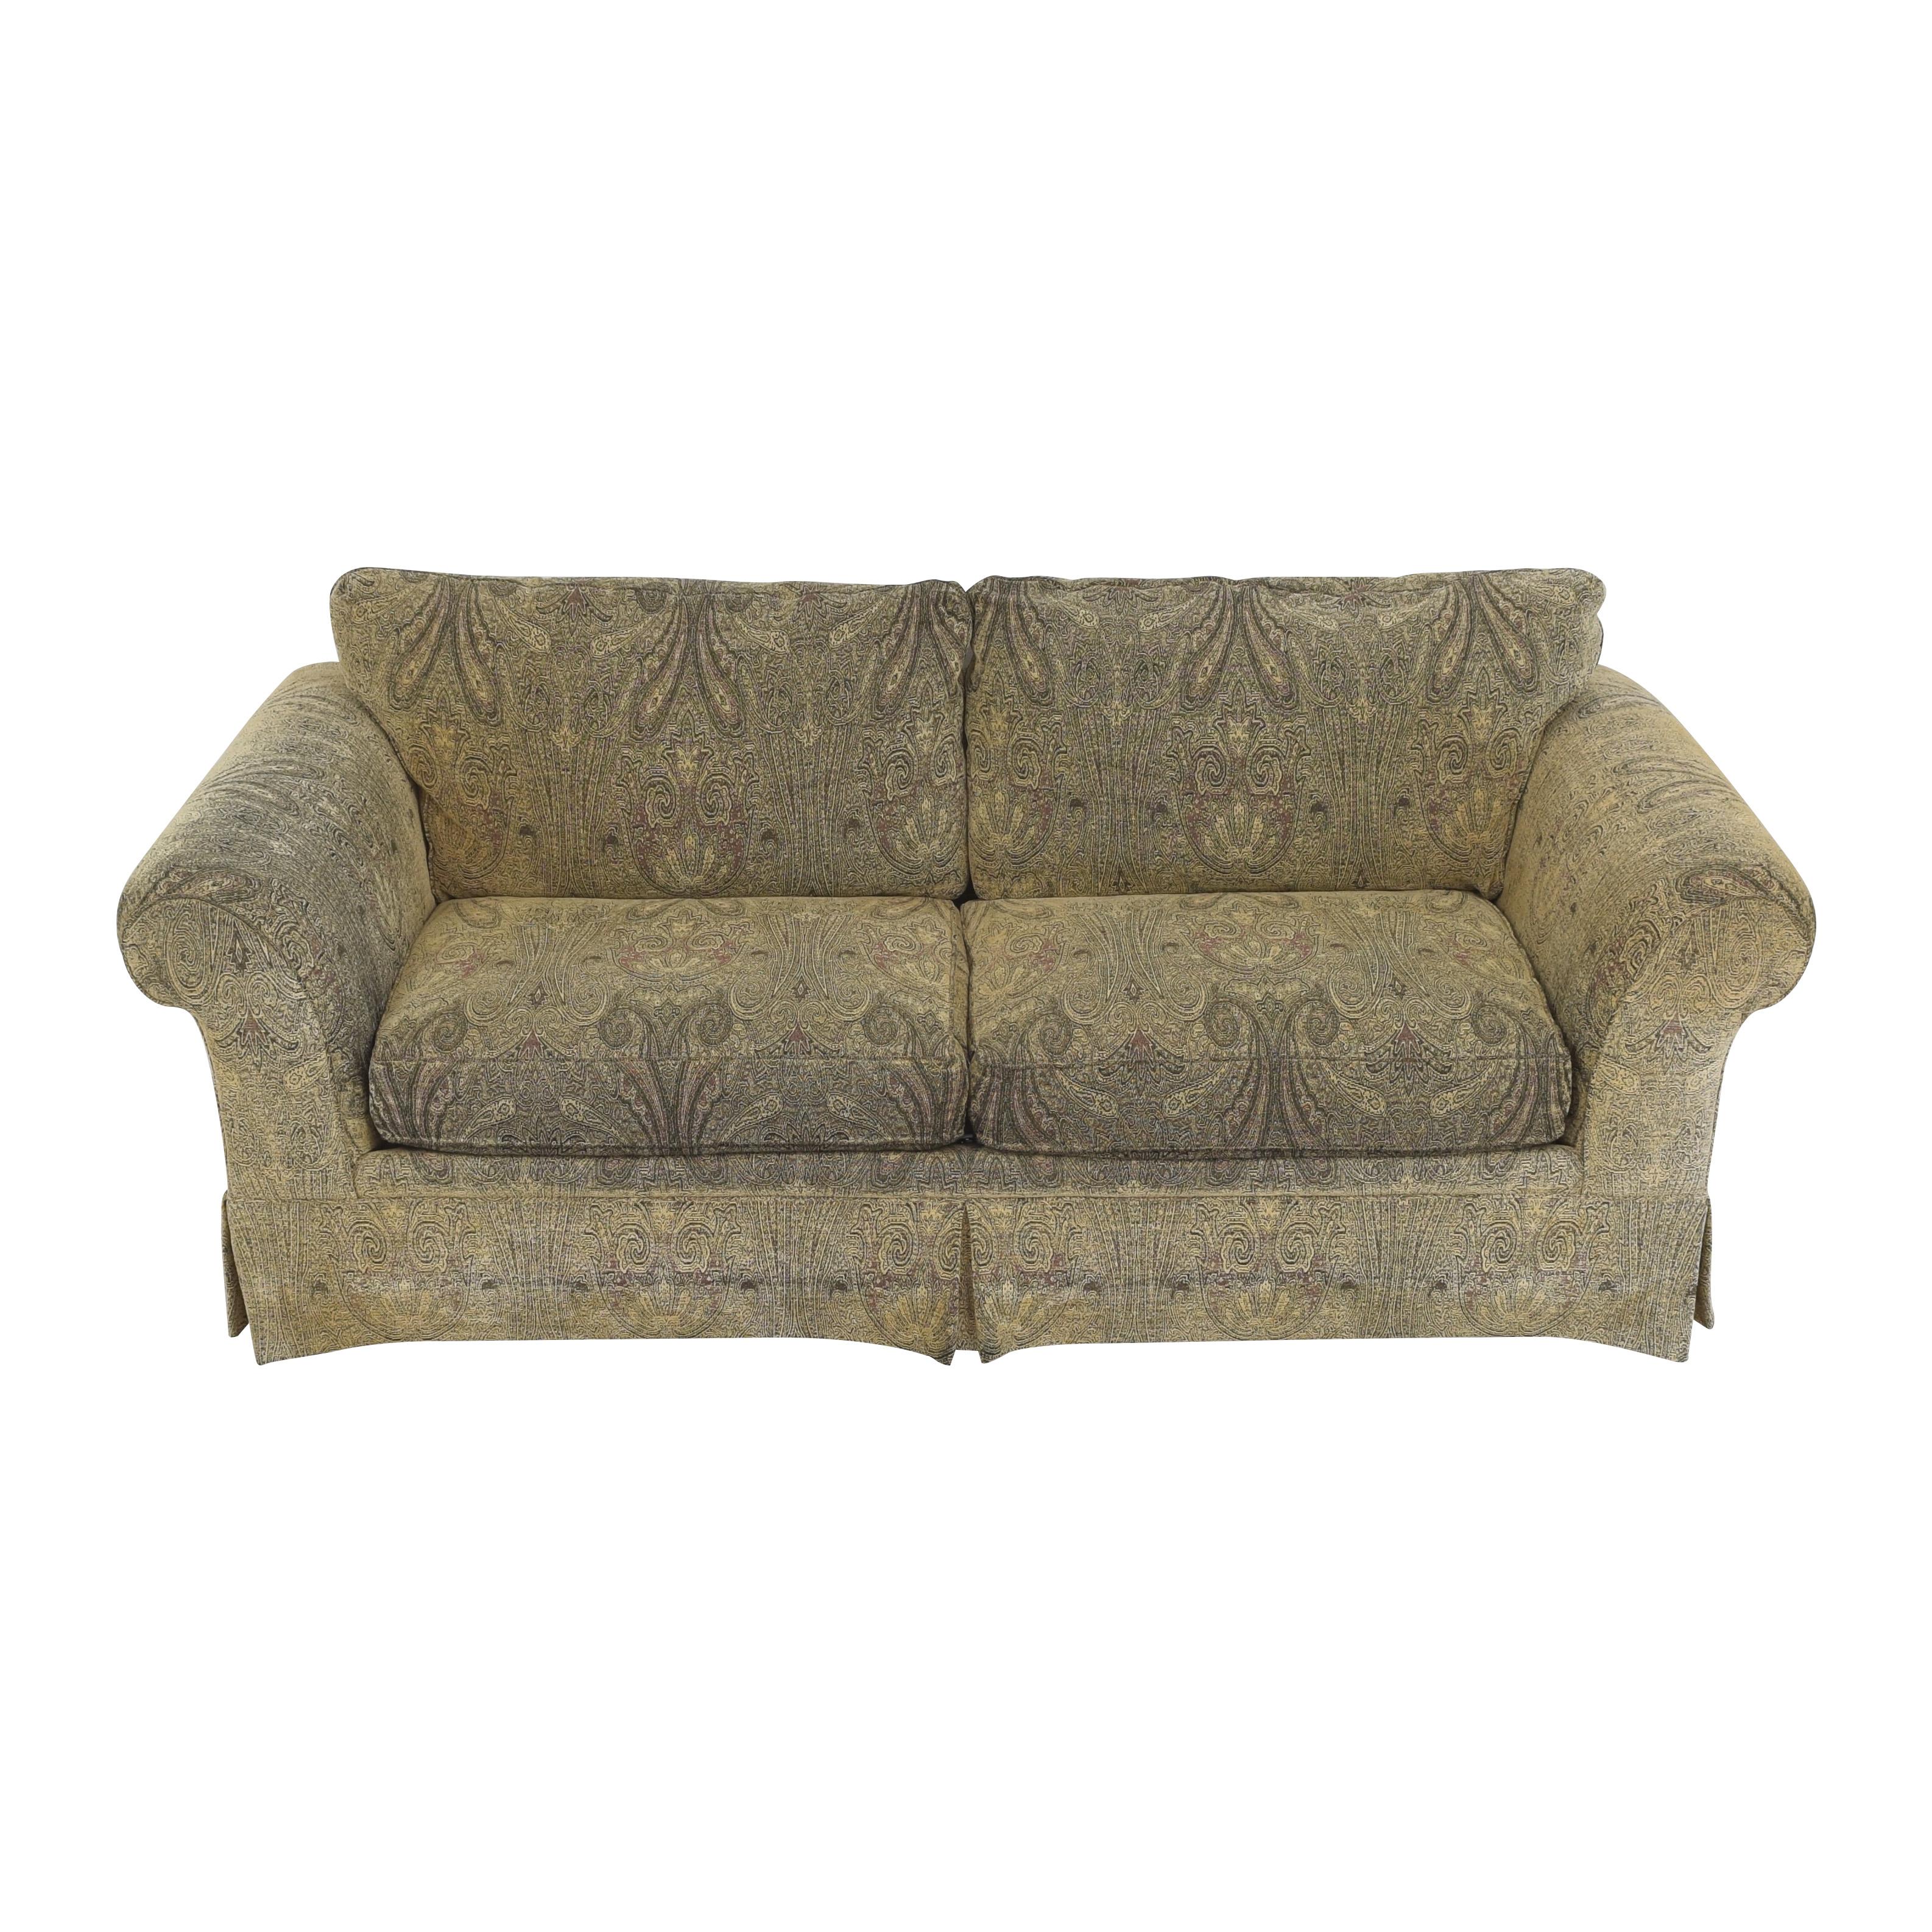 Sherrill Furniture Sherill Furniture Two Cushion Sofa pa